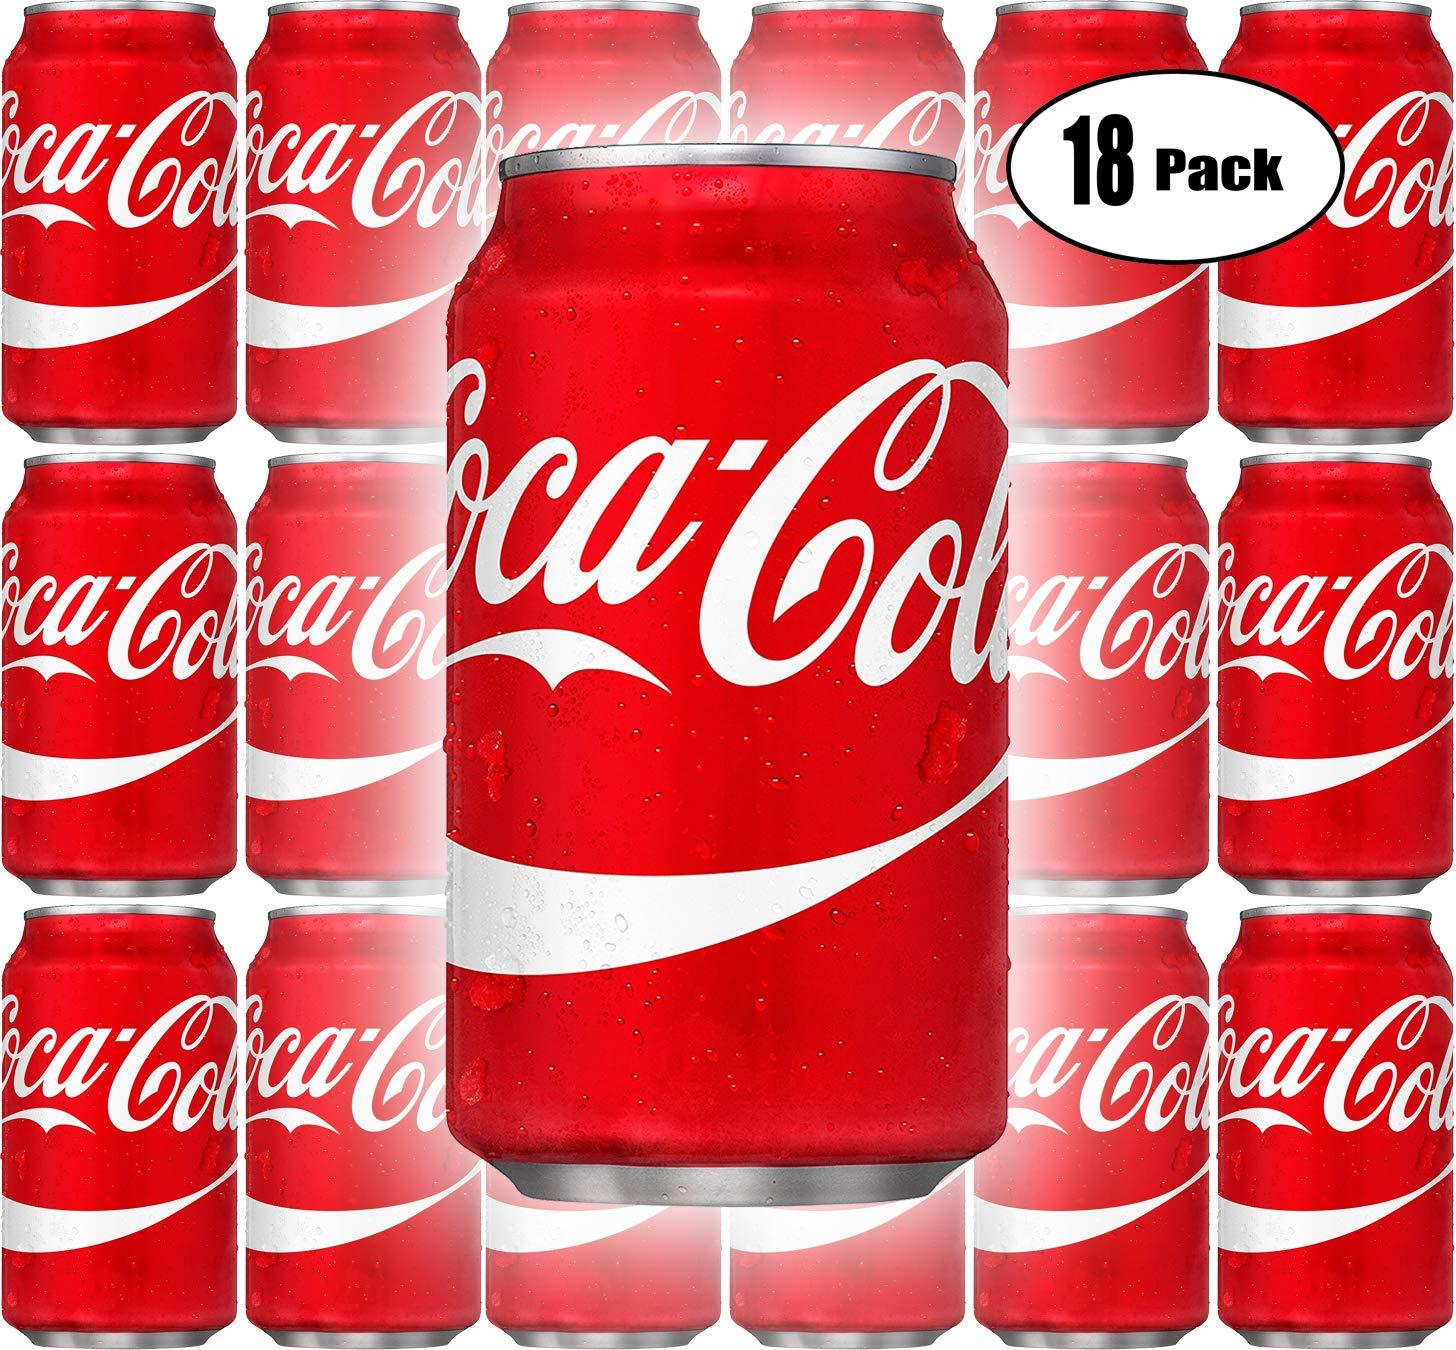 Coca-Cola, Coke Classic, Original, 12oz Cans (Pack of 18, Total of 216 oz)